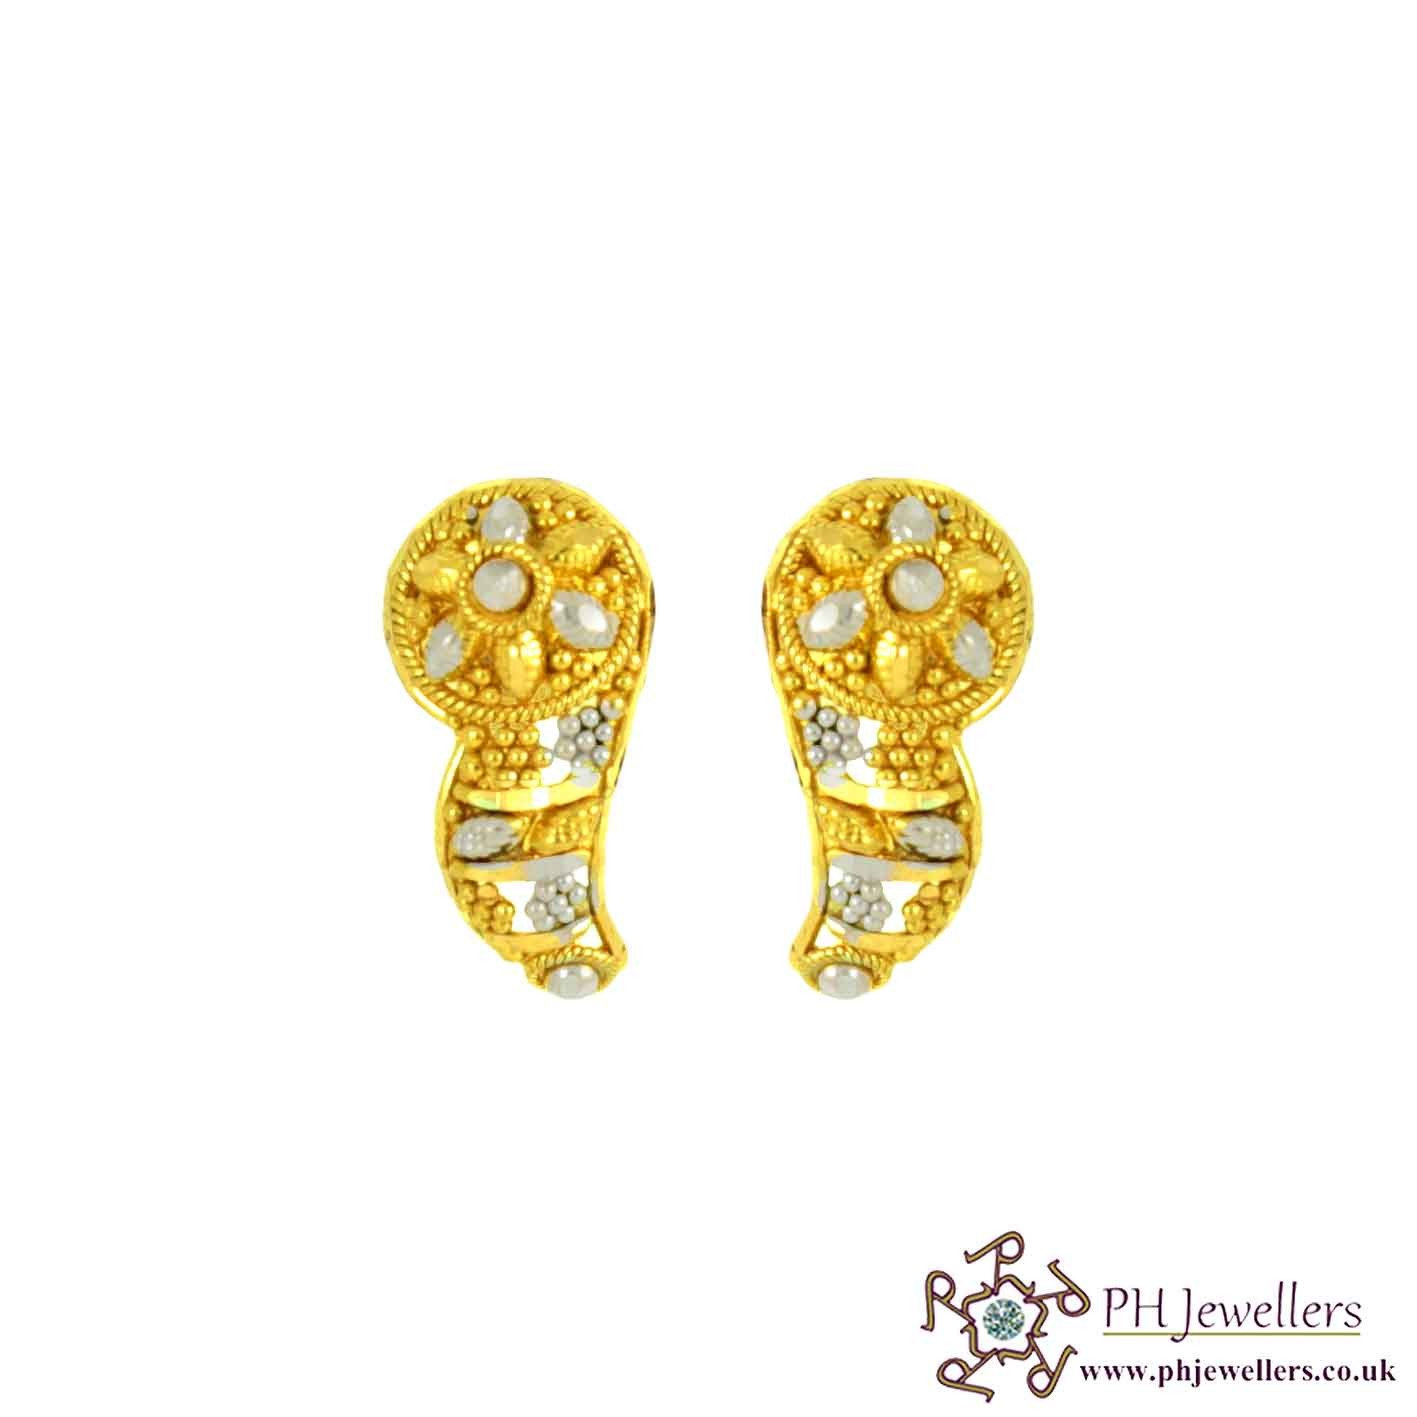 22ct 916 Hallmark Yellow Gold Round Earring TE79